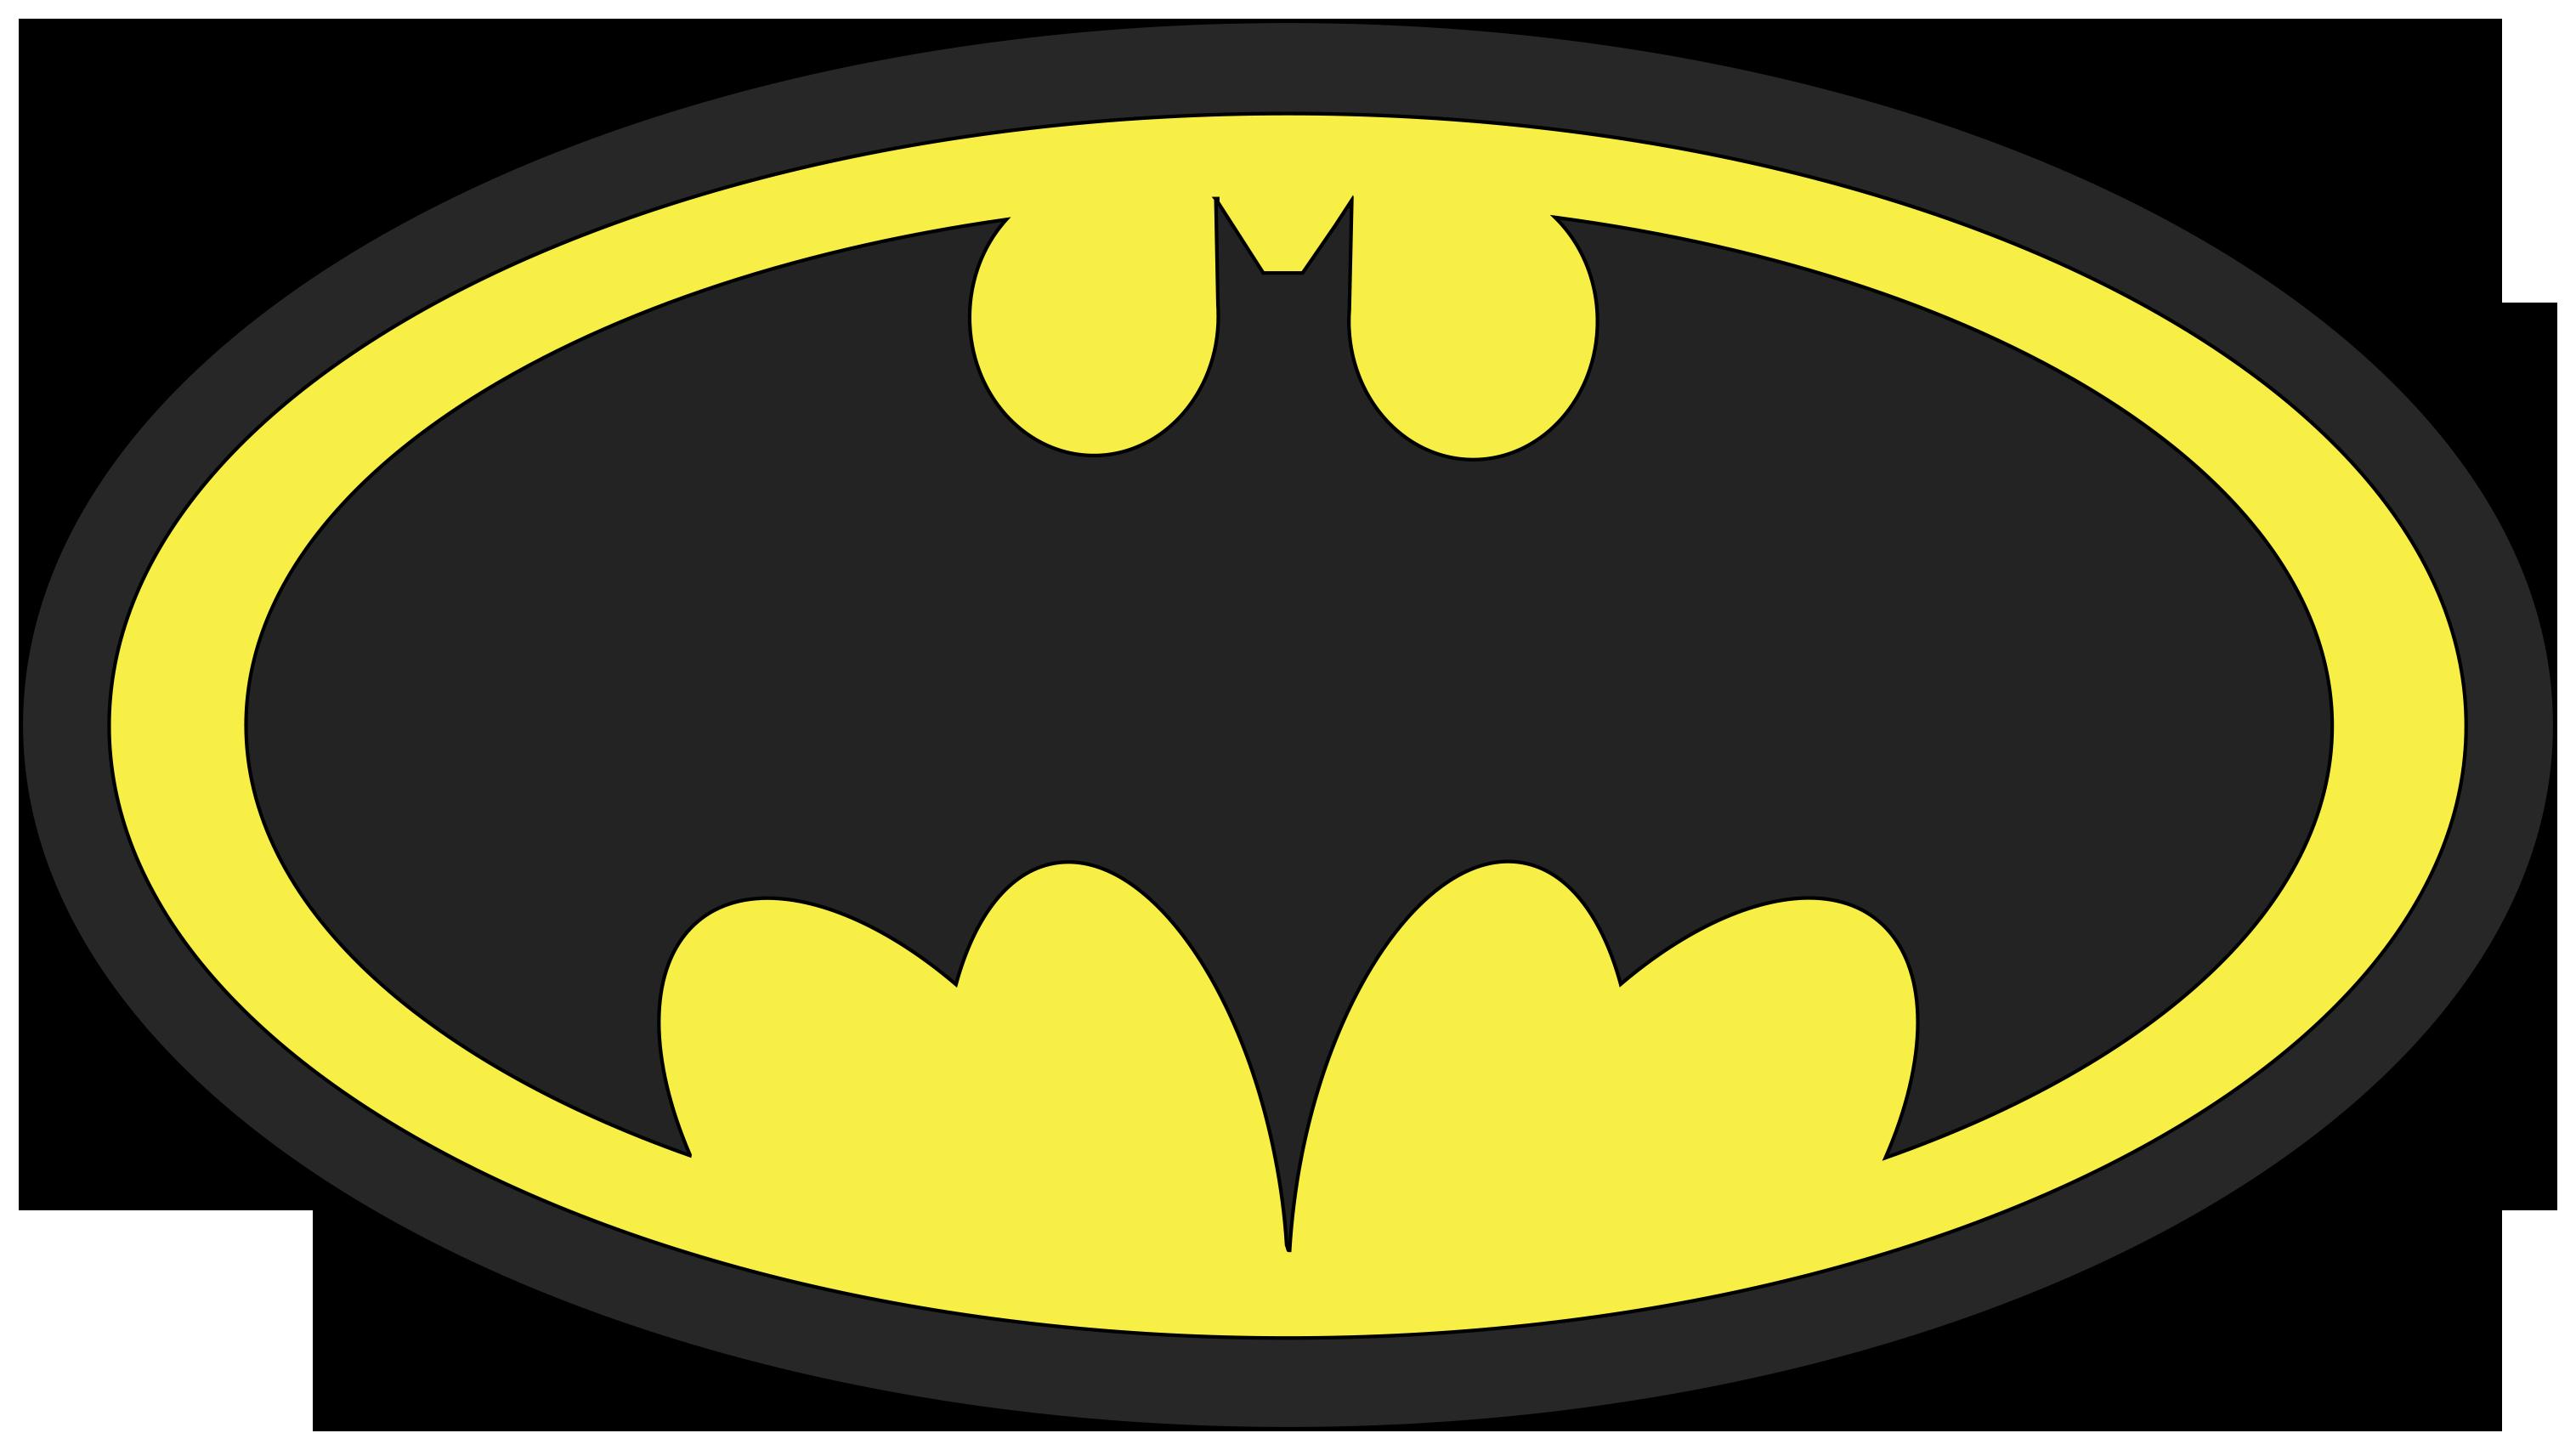 batman logo clip art template - photo #16